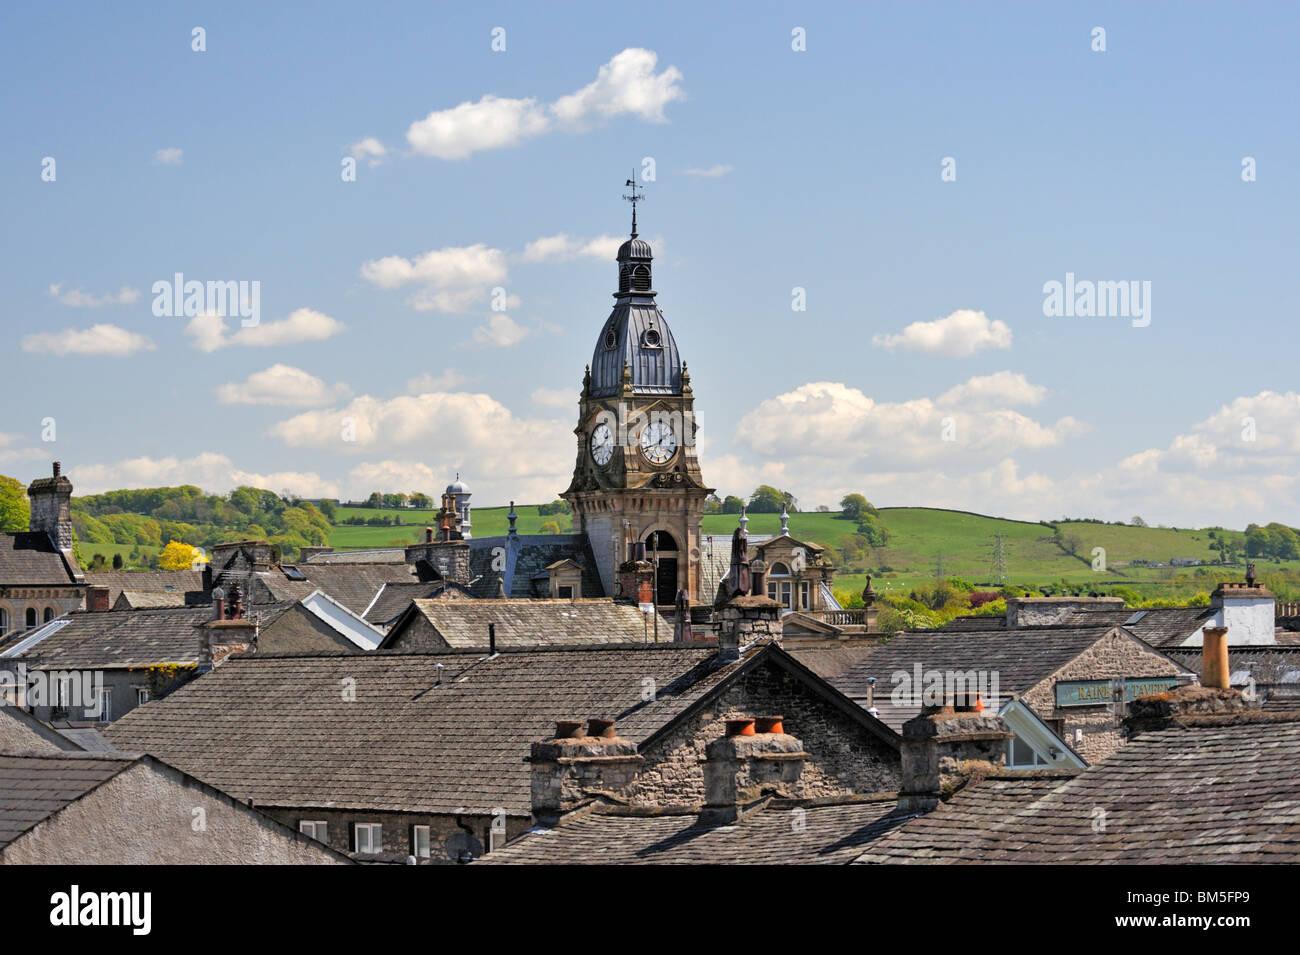 the-town-hall-kendal-cumbria-england-united-kingdom-europe-BM5FP9.jpg